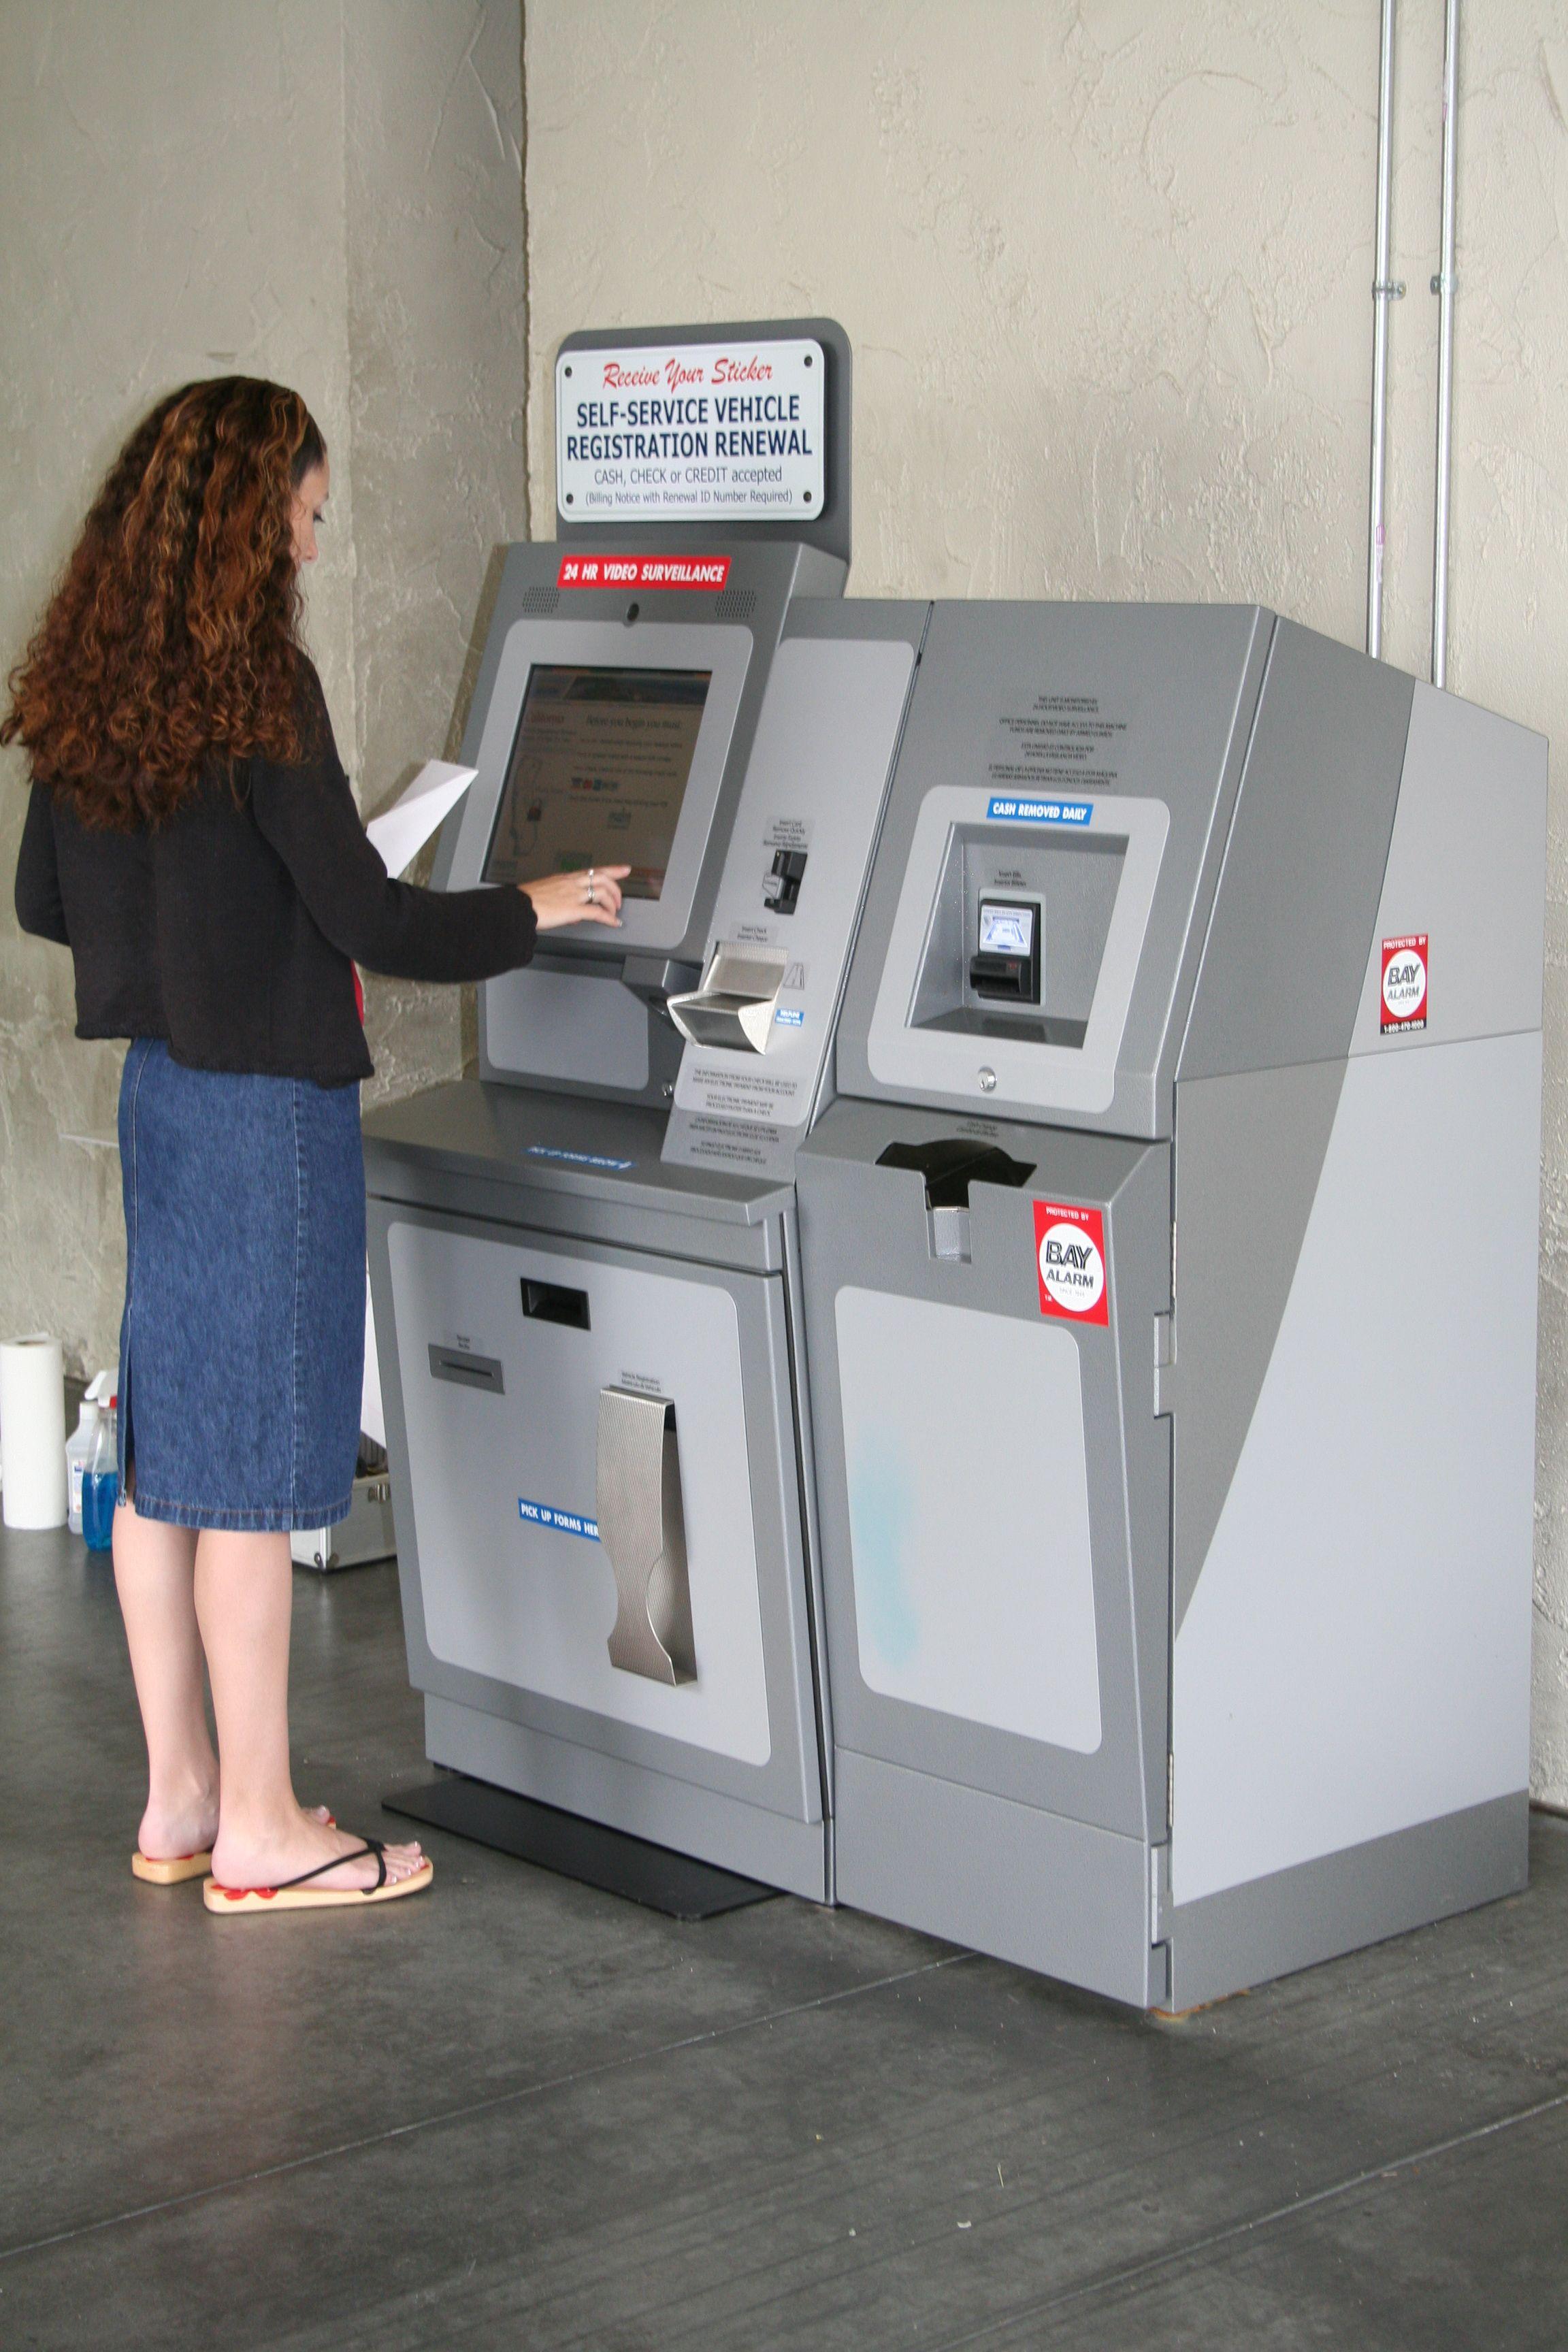 DMV Kiosk Home appliances, Kiosk, Washing machine